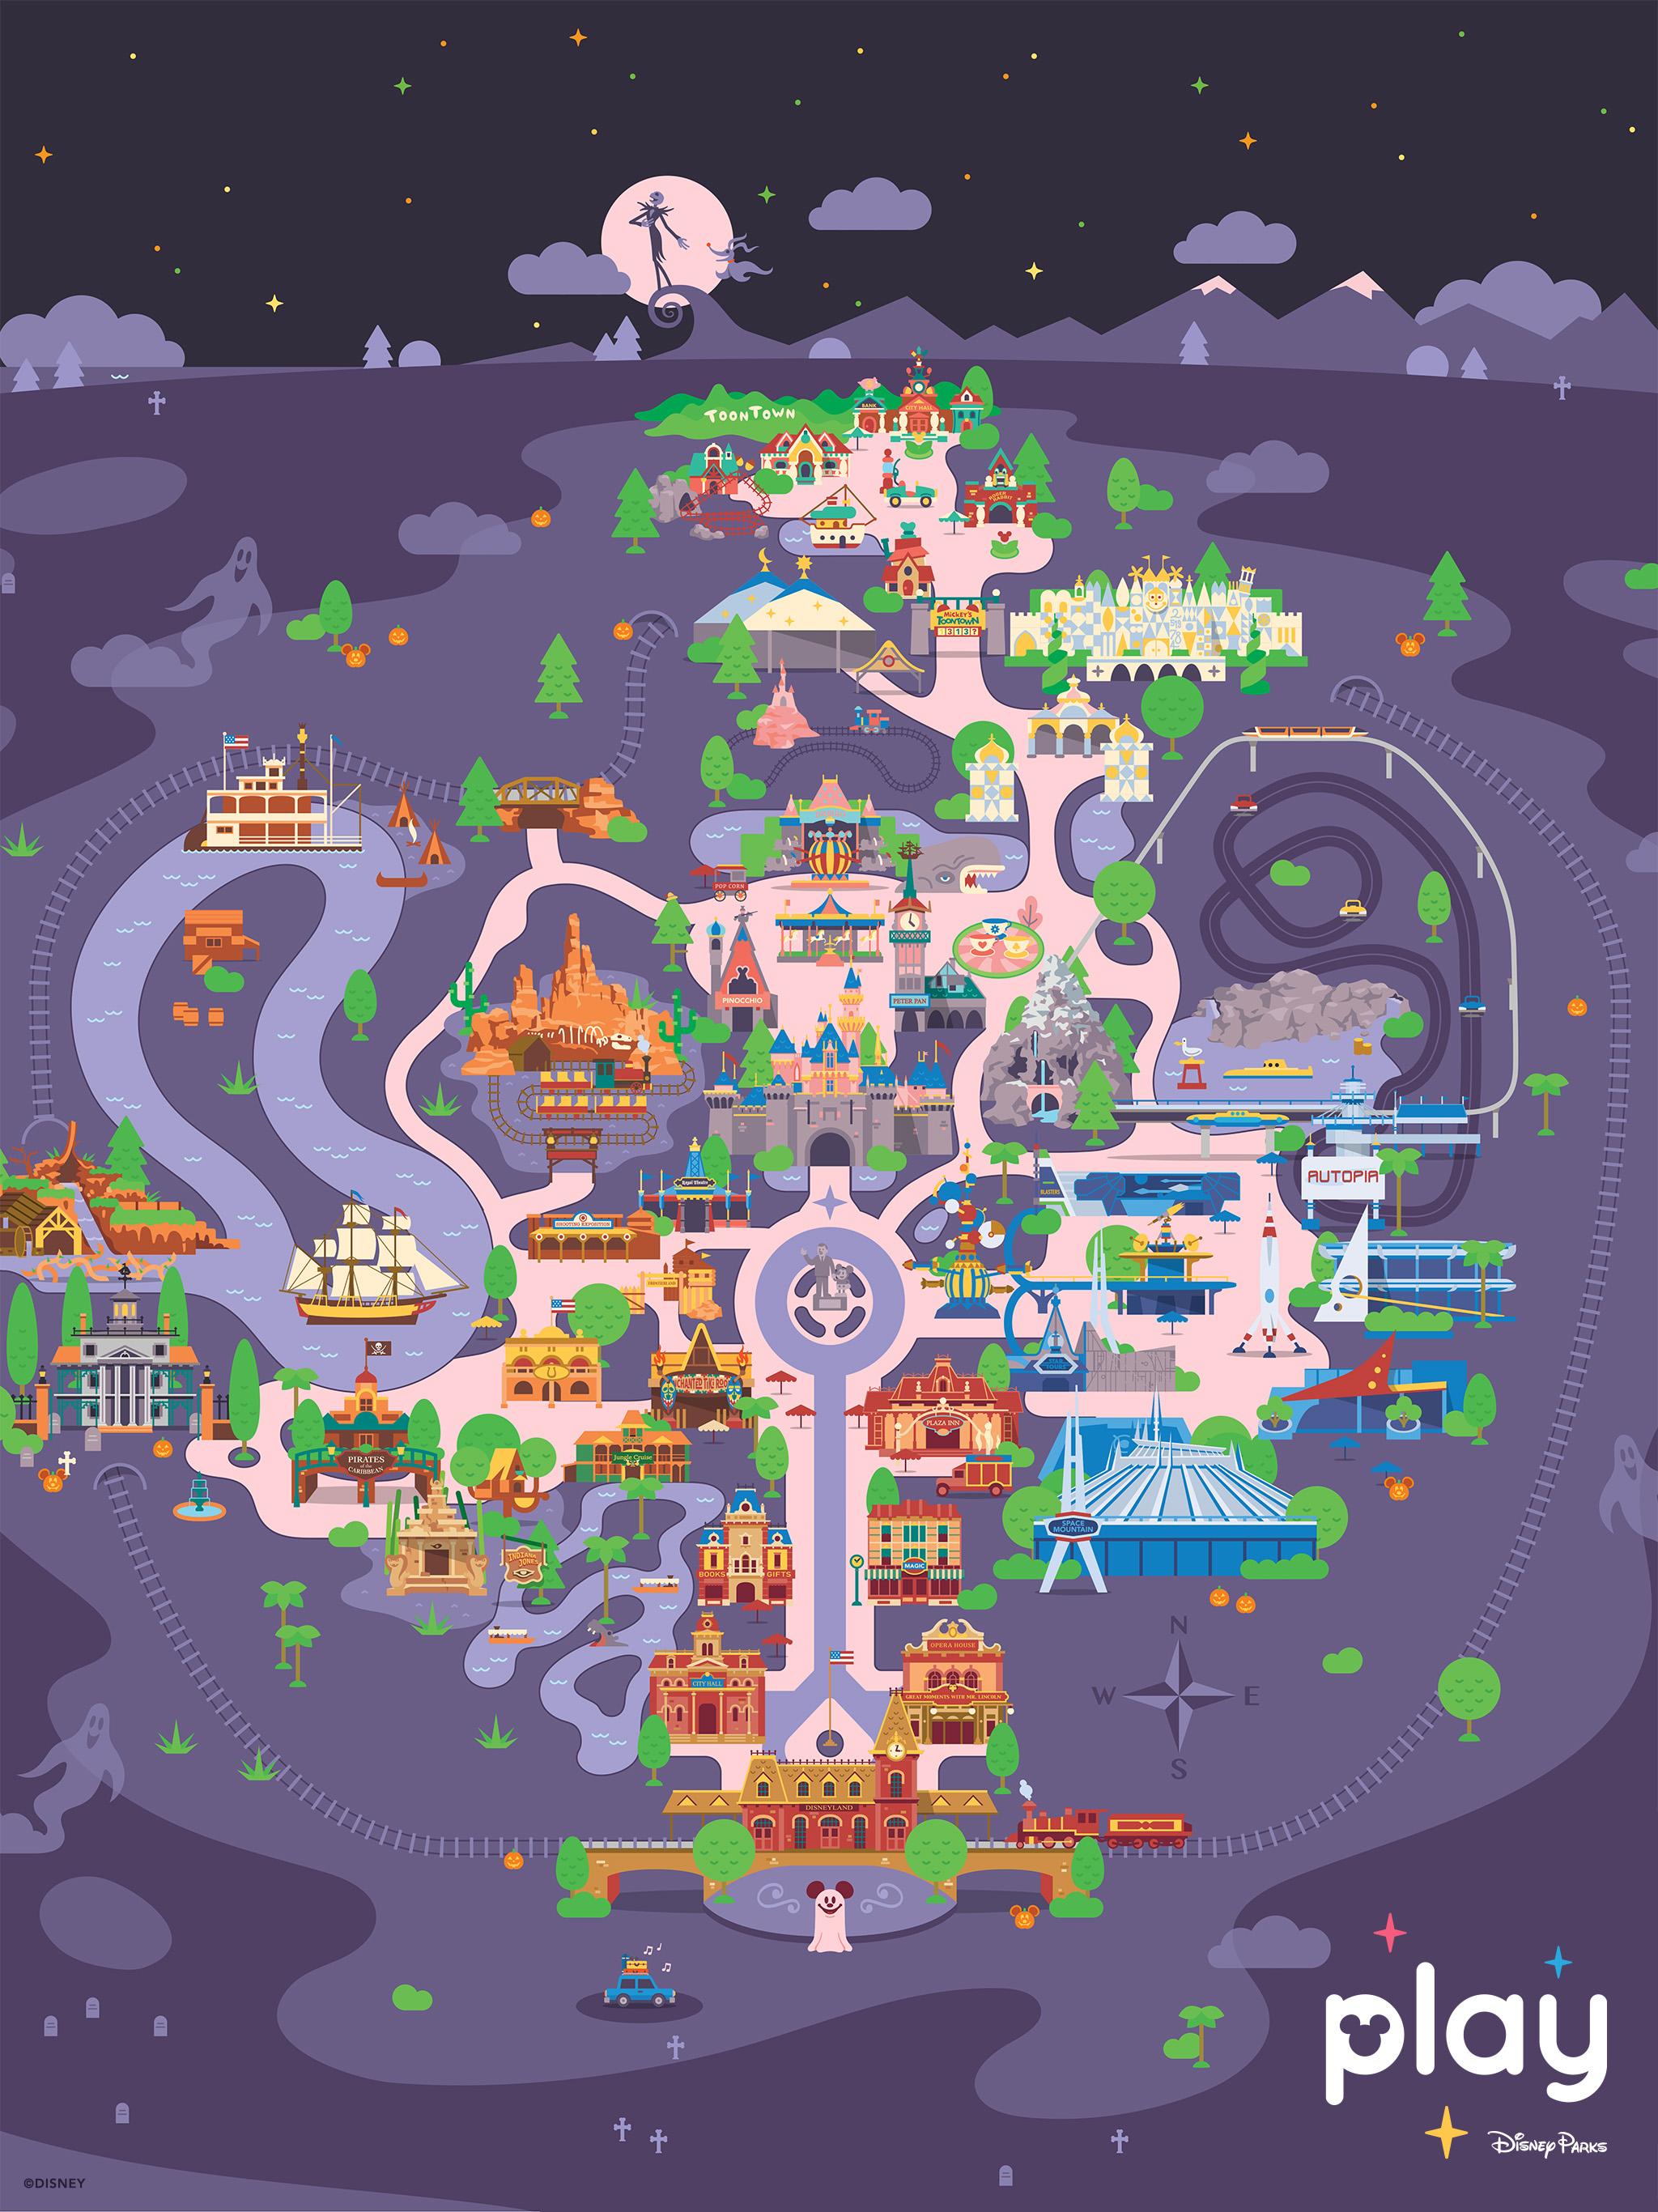 Play Disney Parks Wallpaper Disneyland Park Disney